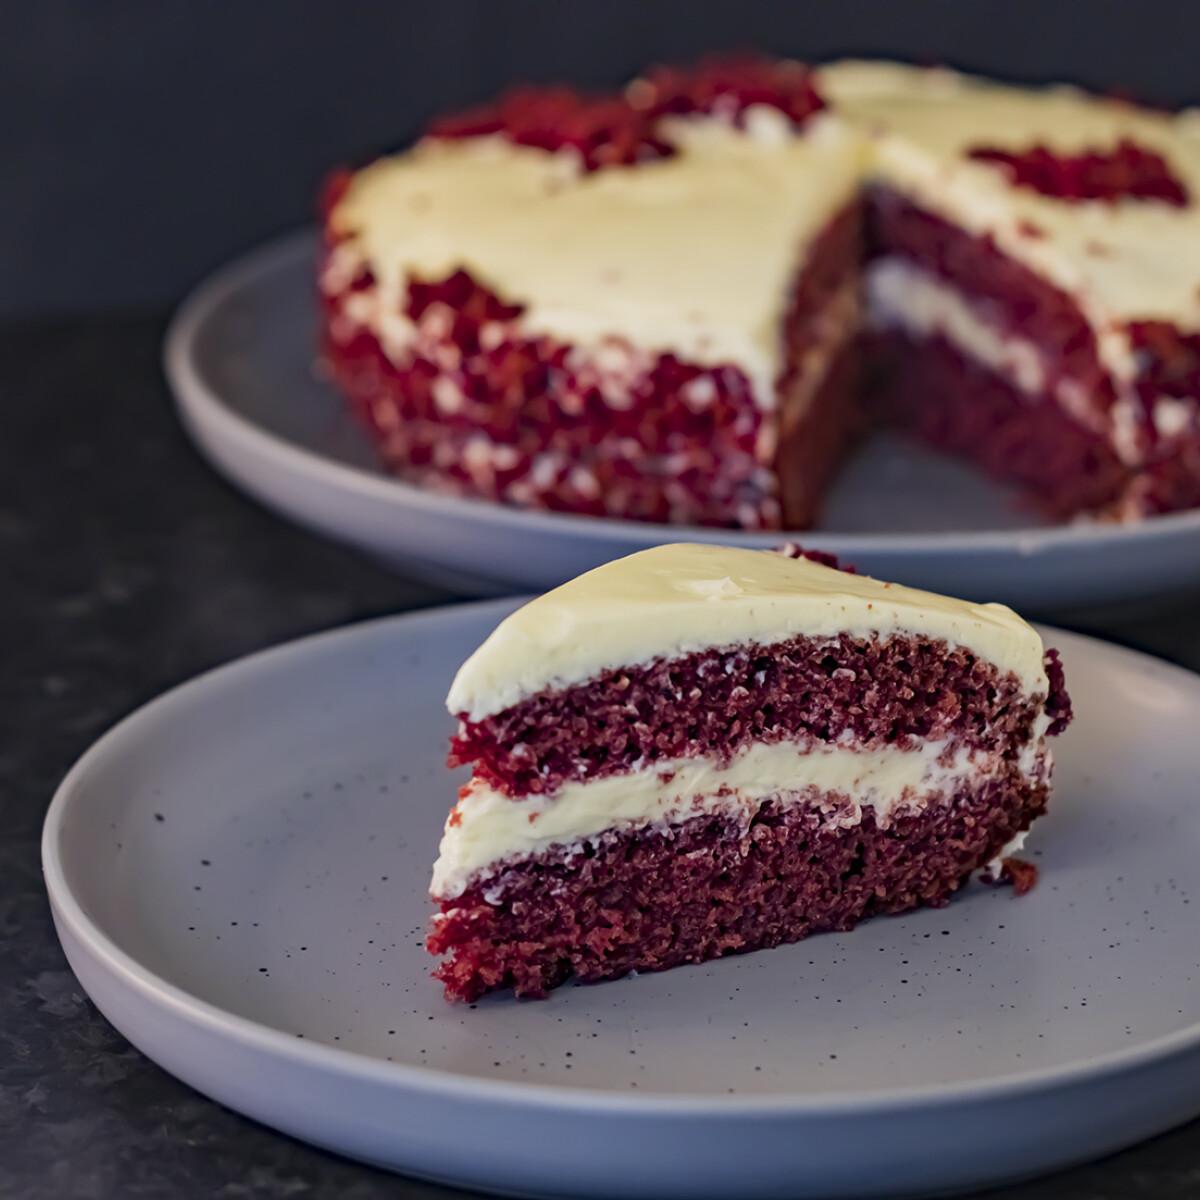 Red velvet - Vörösbársony torta